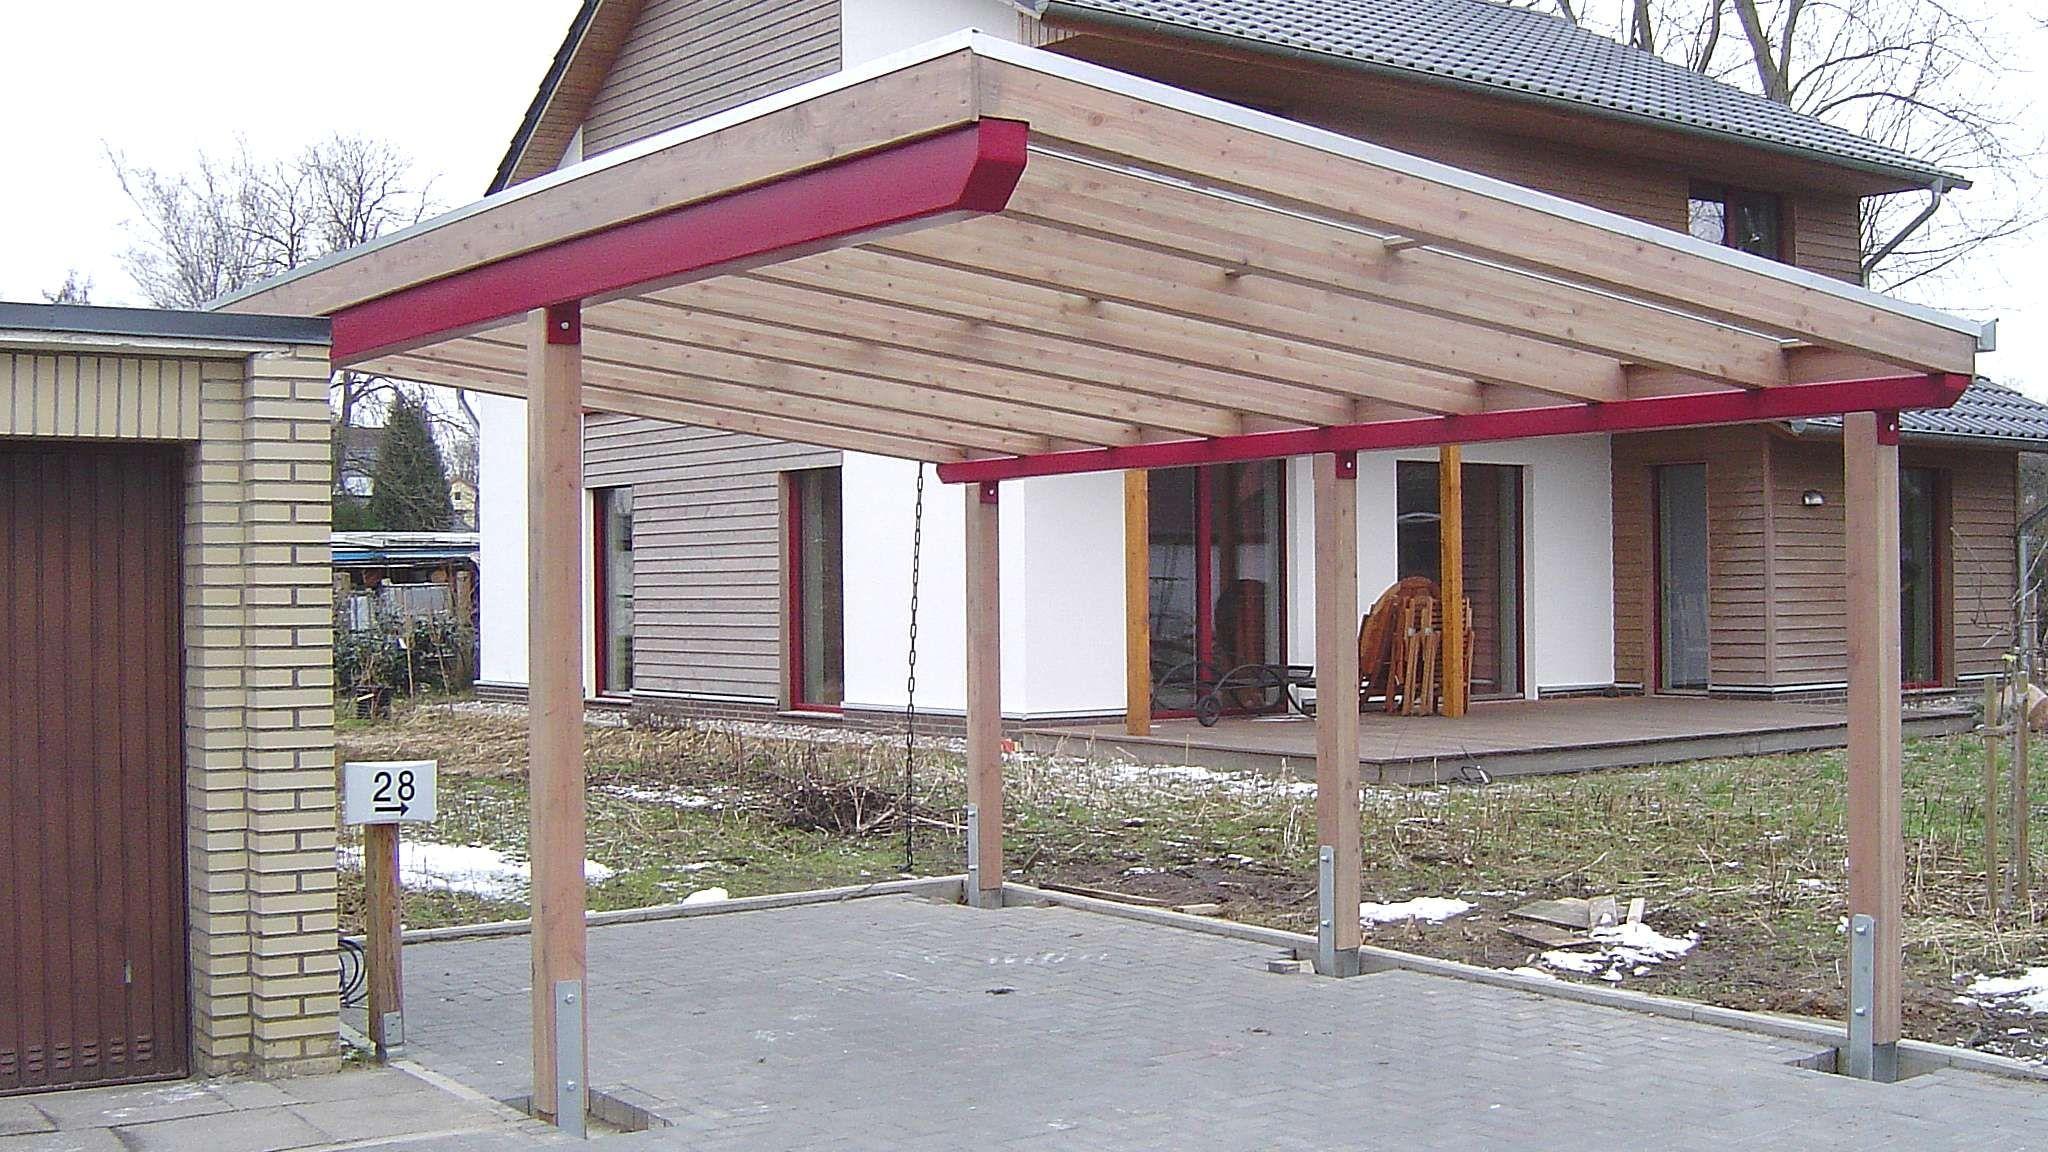 Glasdach Carports Carport in Holz, Alu, Stahl. Carport